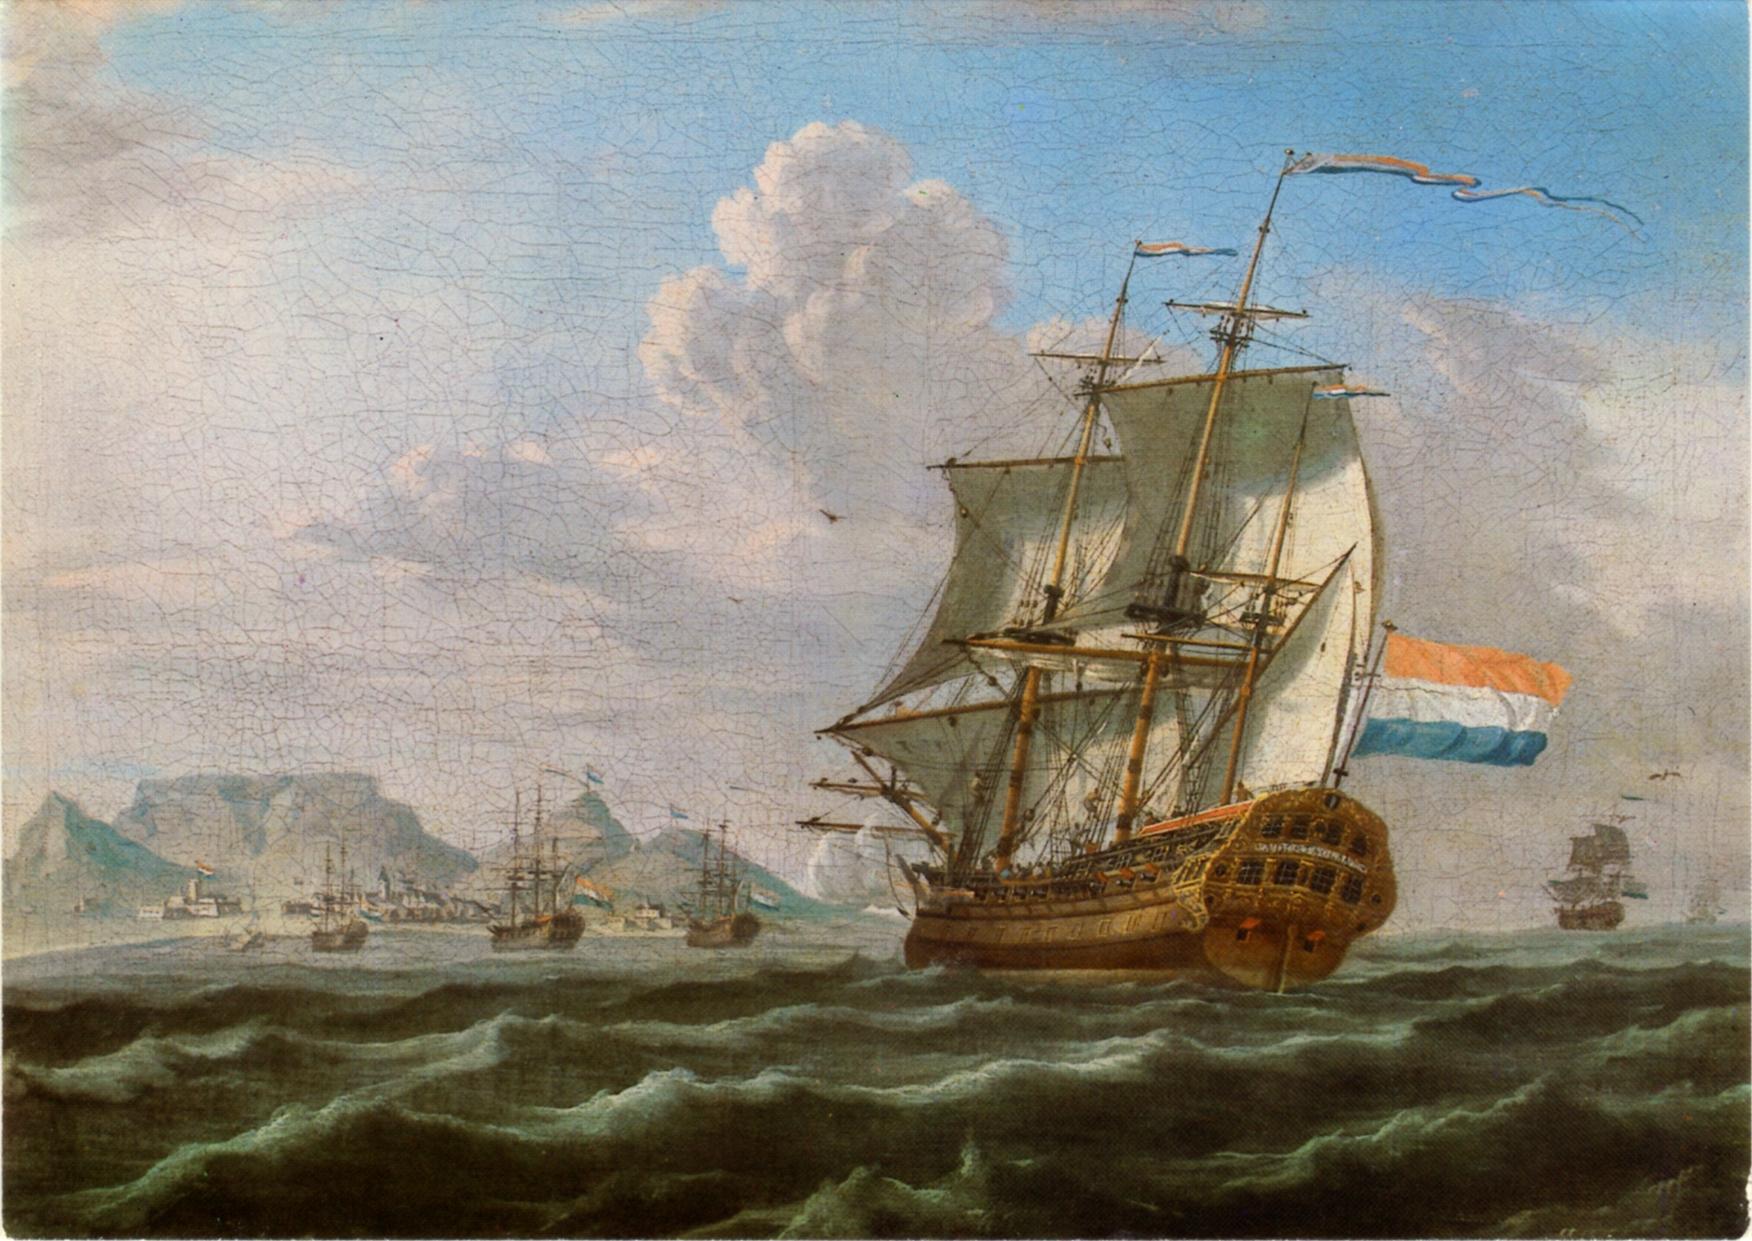 Compagnia Indie Orientali olandese 1762